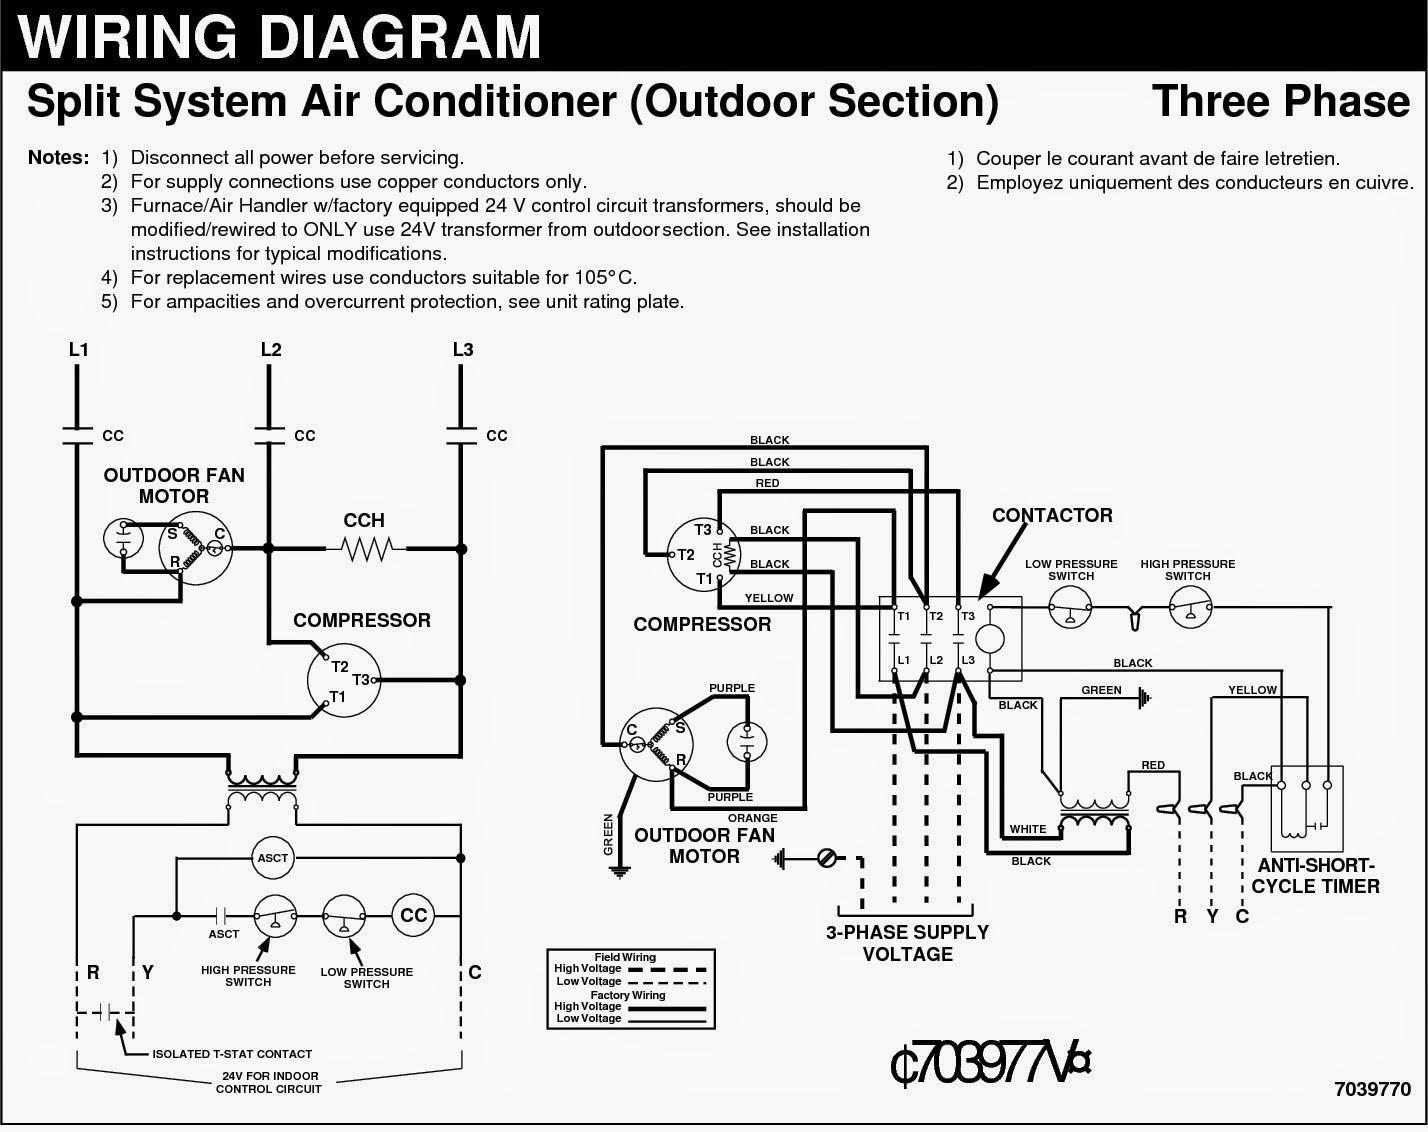 rr9 relay wiring diagram manual e bookge rr7 wiring diagram manual e bookwiring diagram for ge